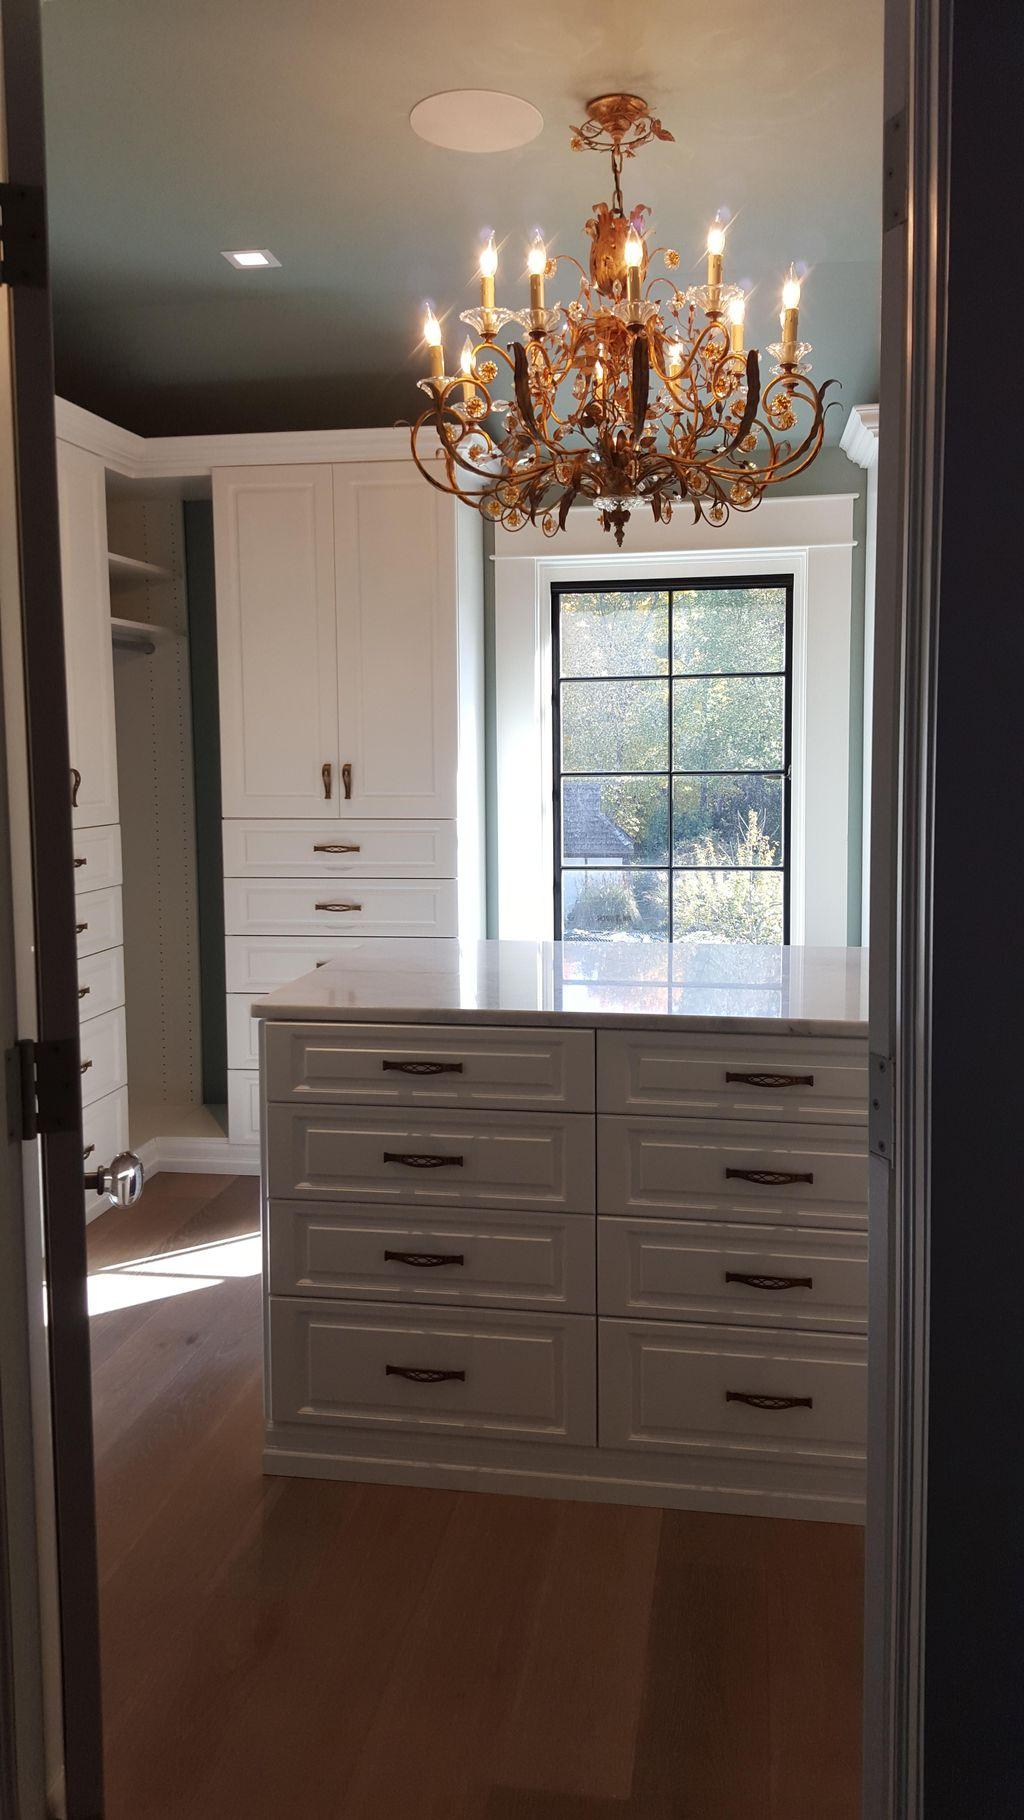 Prestige Closet Designs